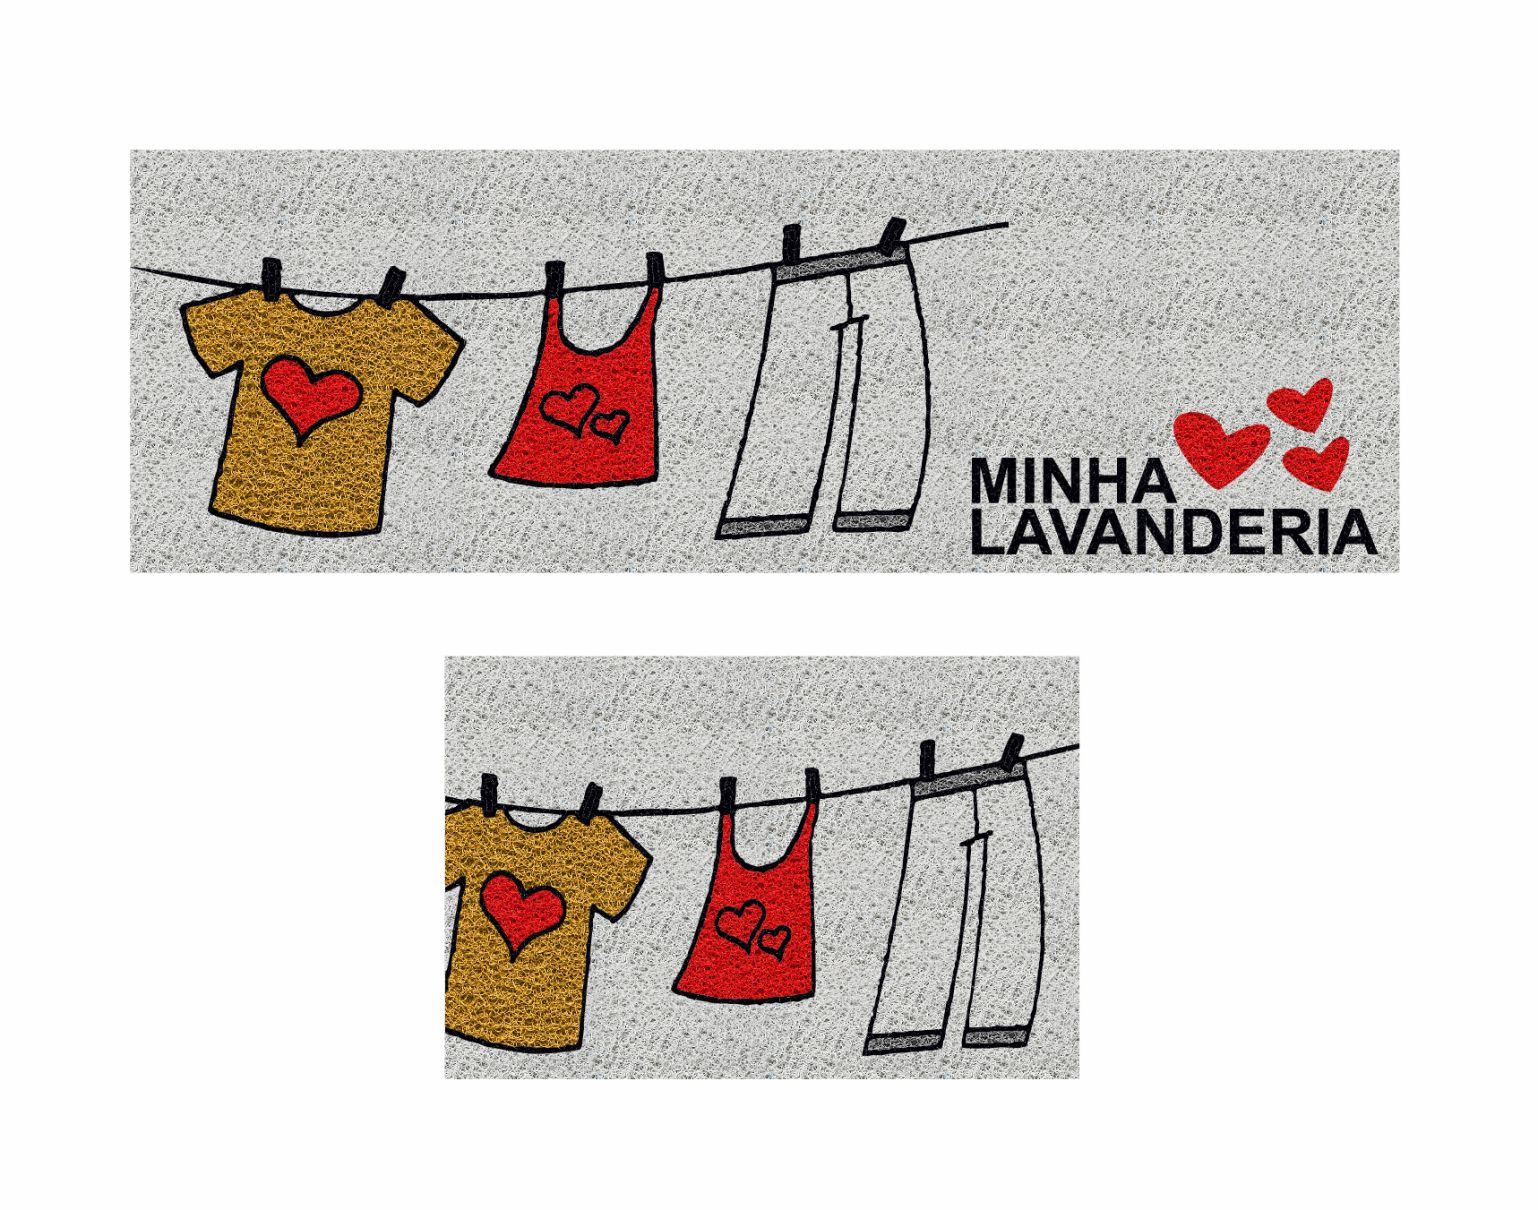 Kit 2 peças, Capachos para Lavanderia, Antiderrapantes 120x40 cm / 60x40 cm - Minha Lavanderia  - Zap Tapetes e Capachos Personalizados